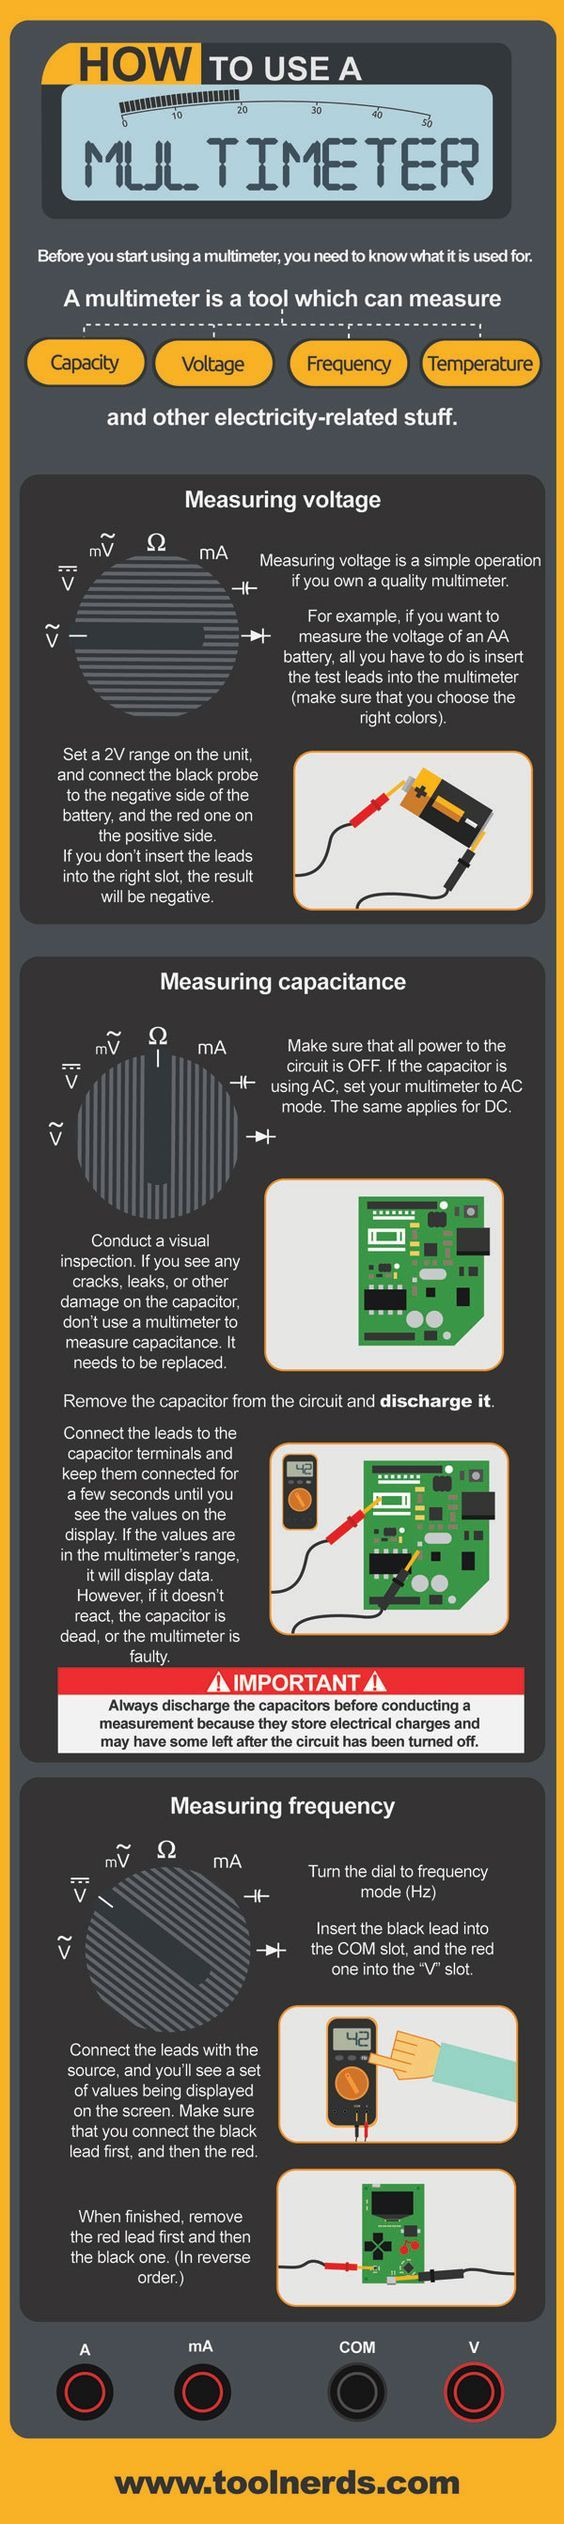 Furnas Magnetic Starter Wiring Diagram Http Wwwfulltextebookcom